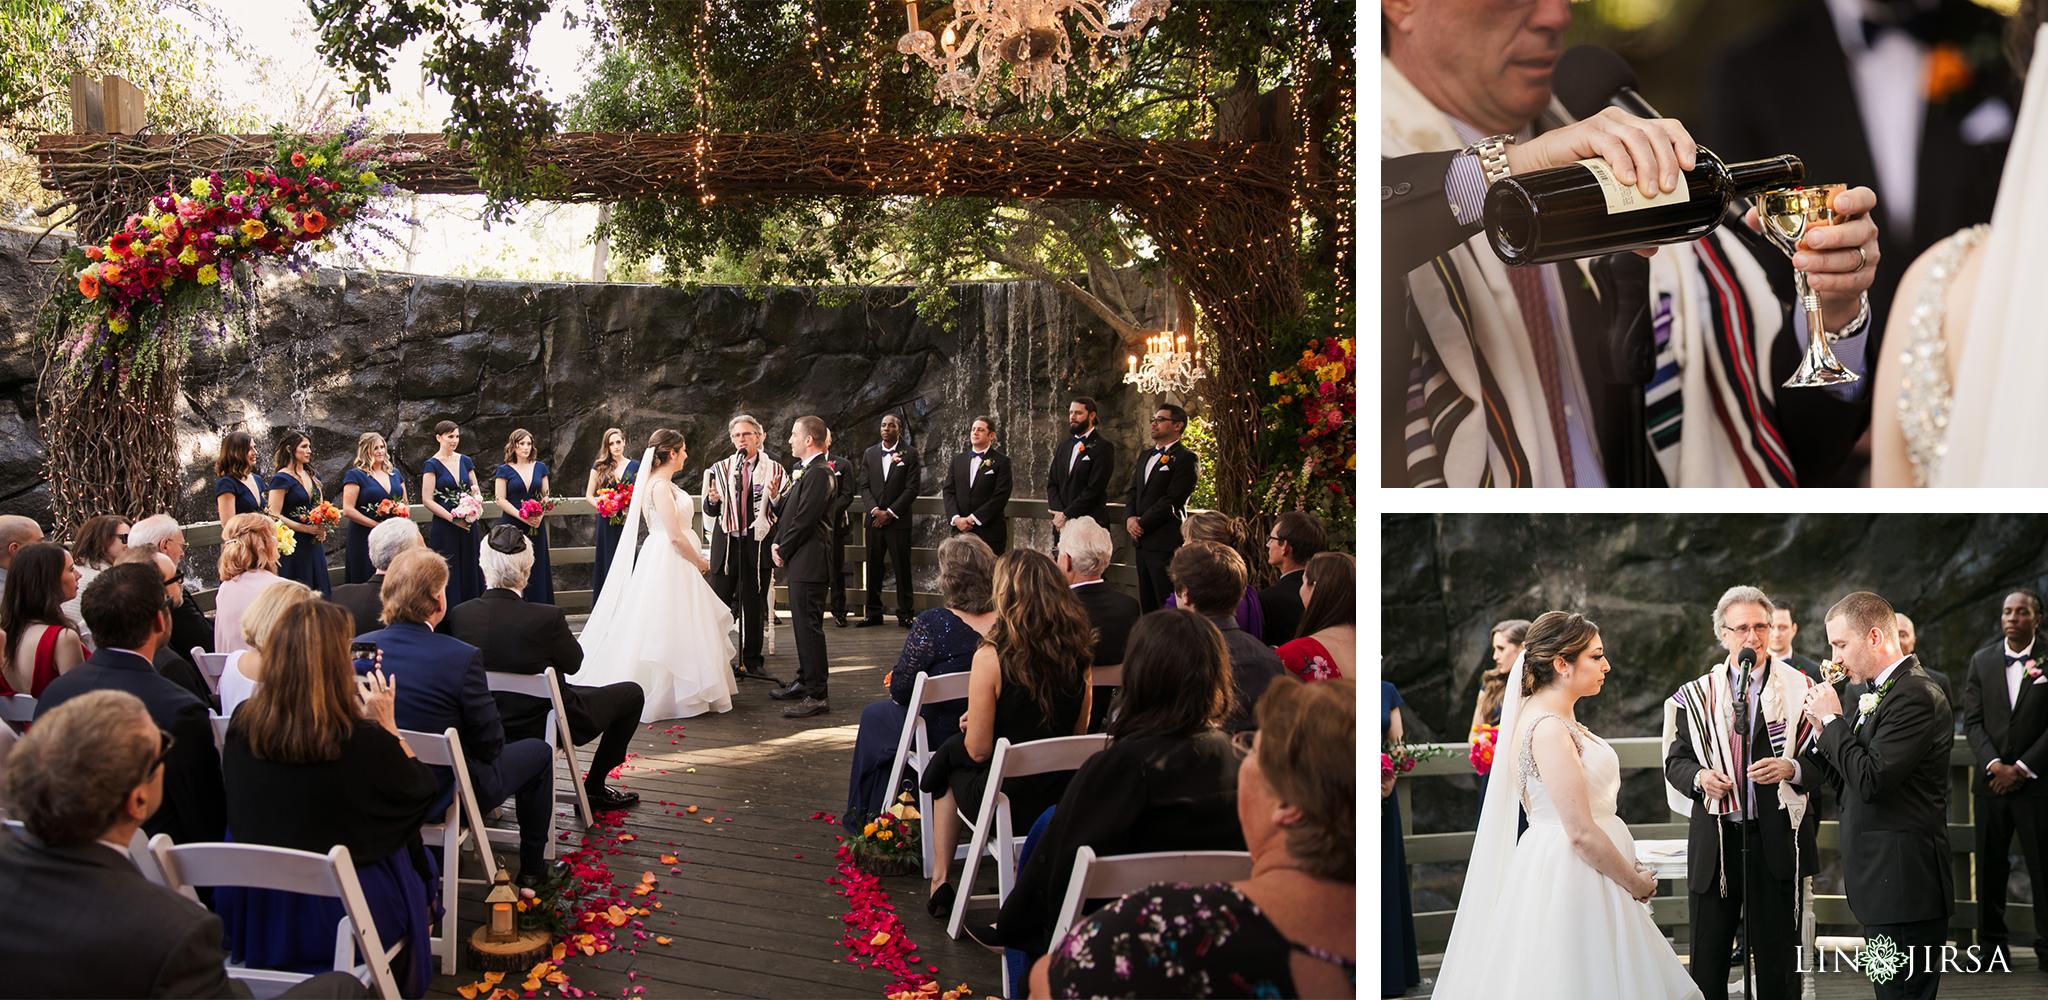 21 Calamigos Ranch Malibu Wedding Photography